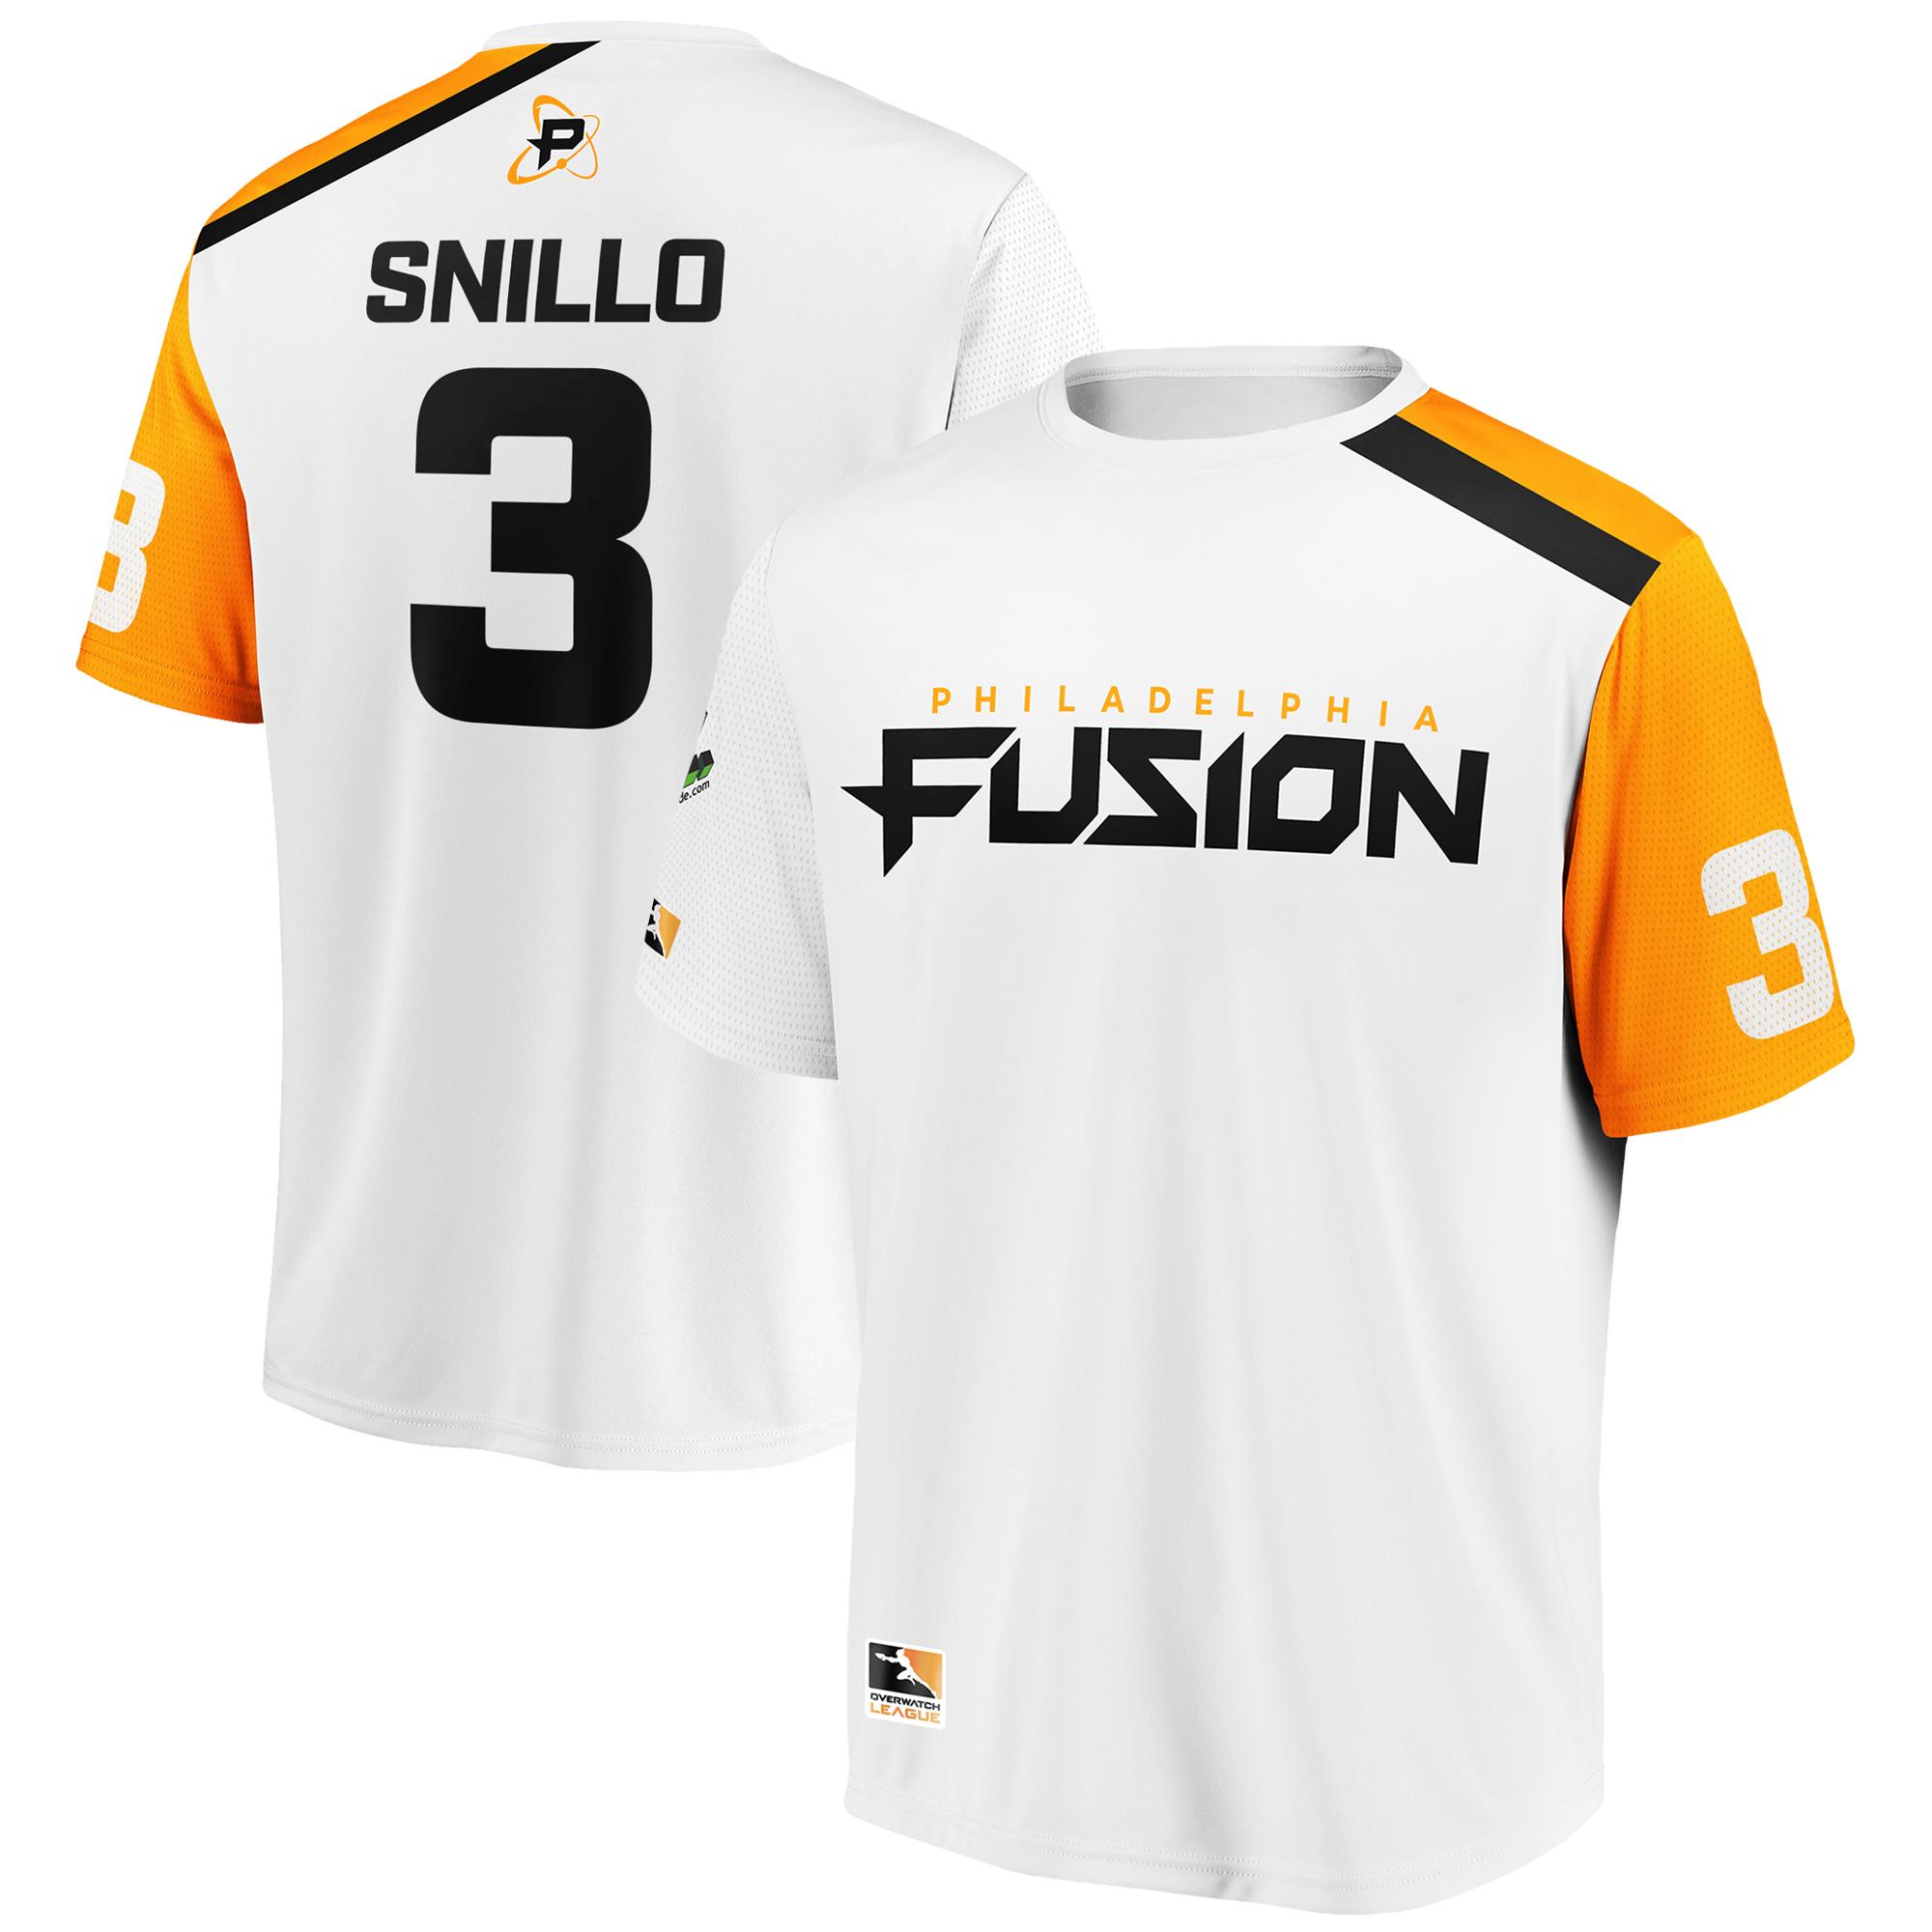 snillo Philadelphia Fusion Overwatch League Replica Away Jersey - White